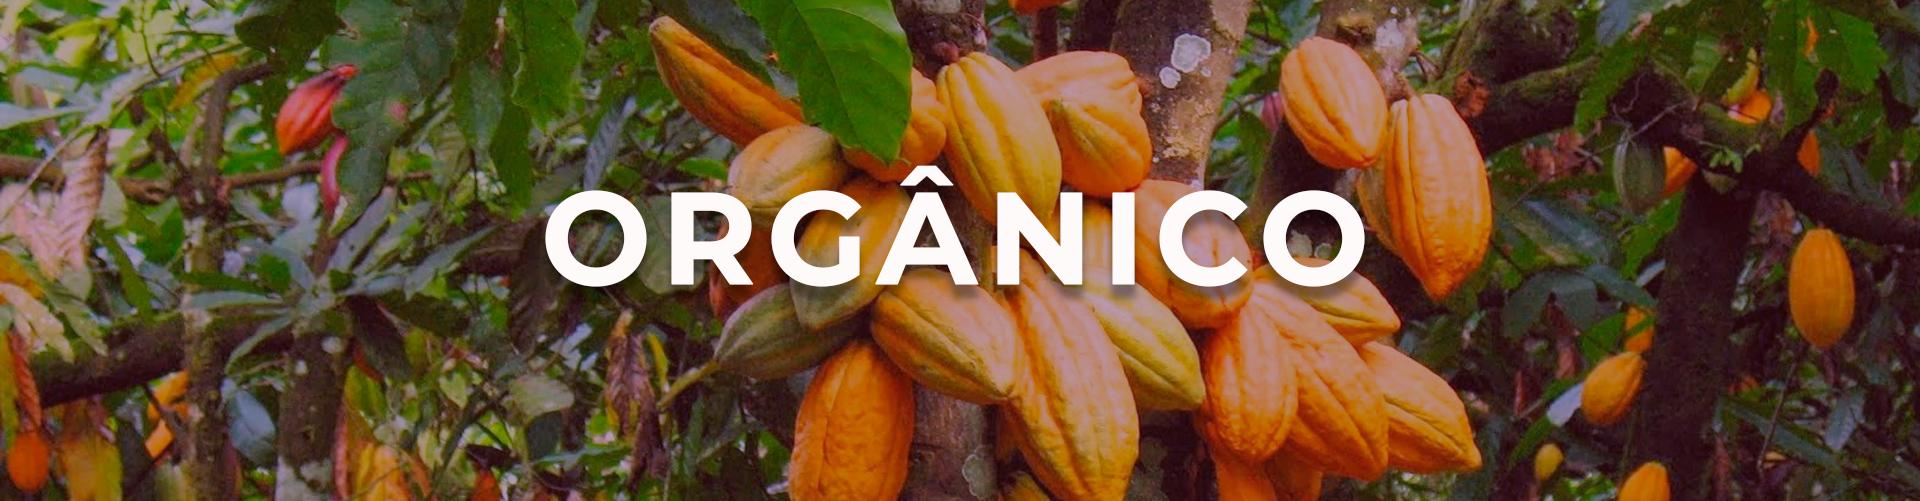 Banner Organico